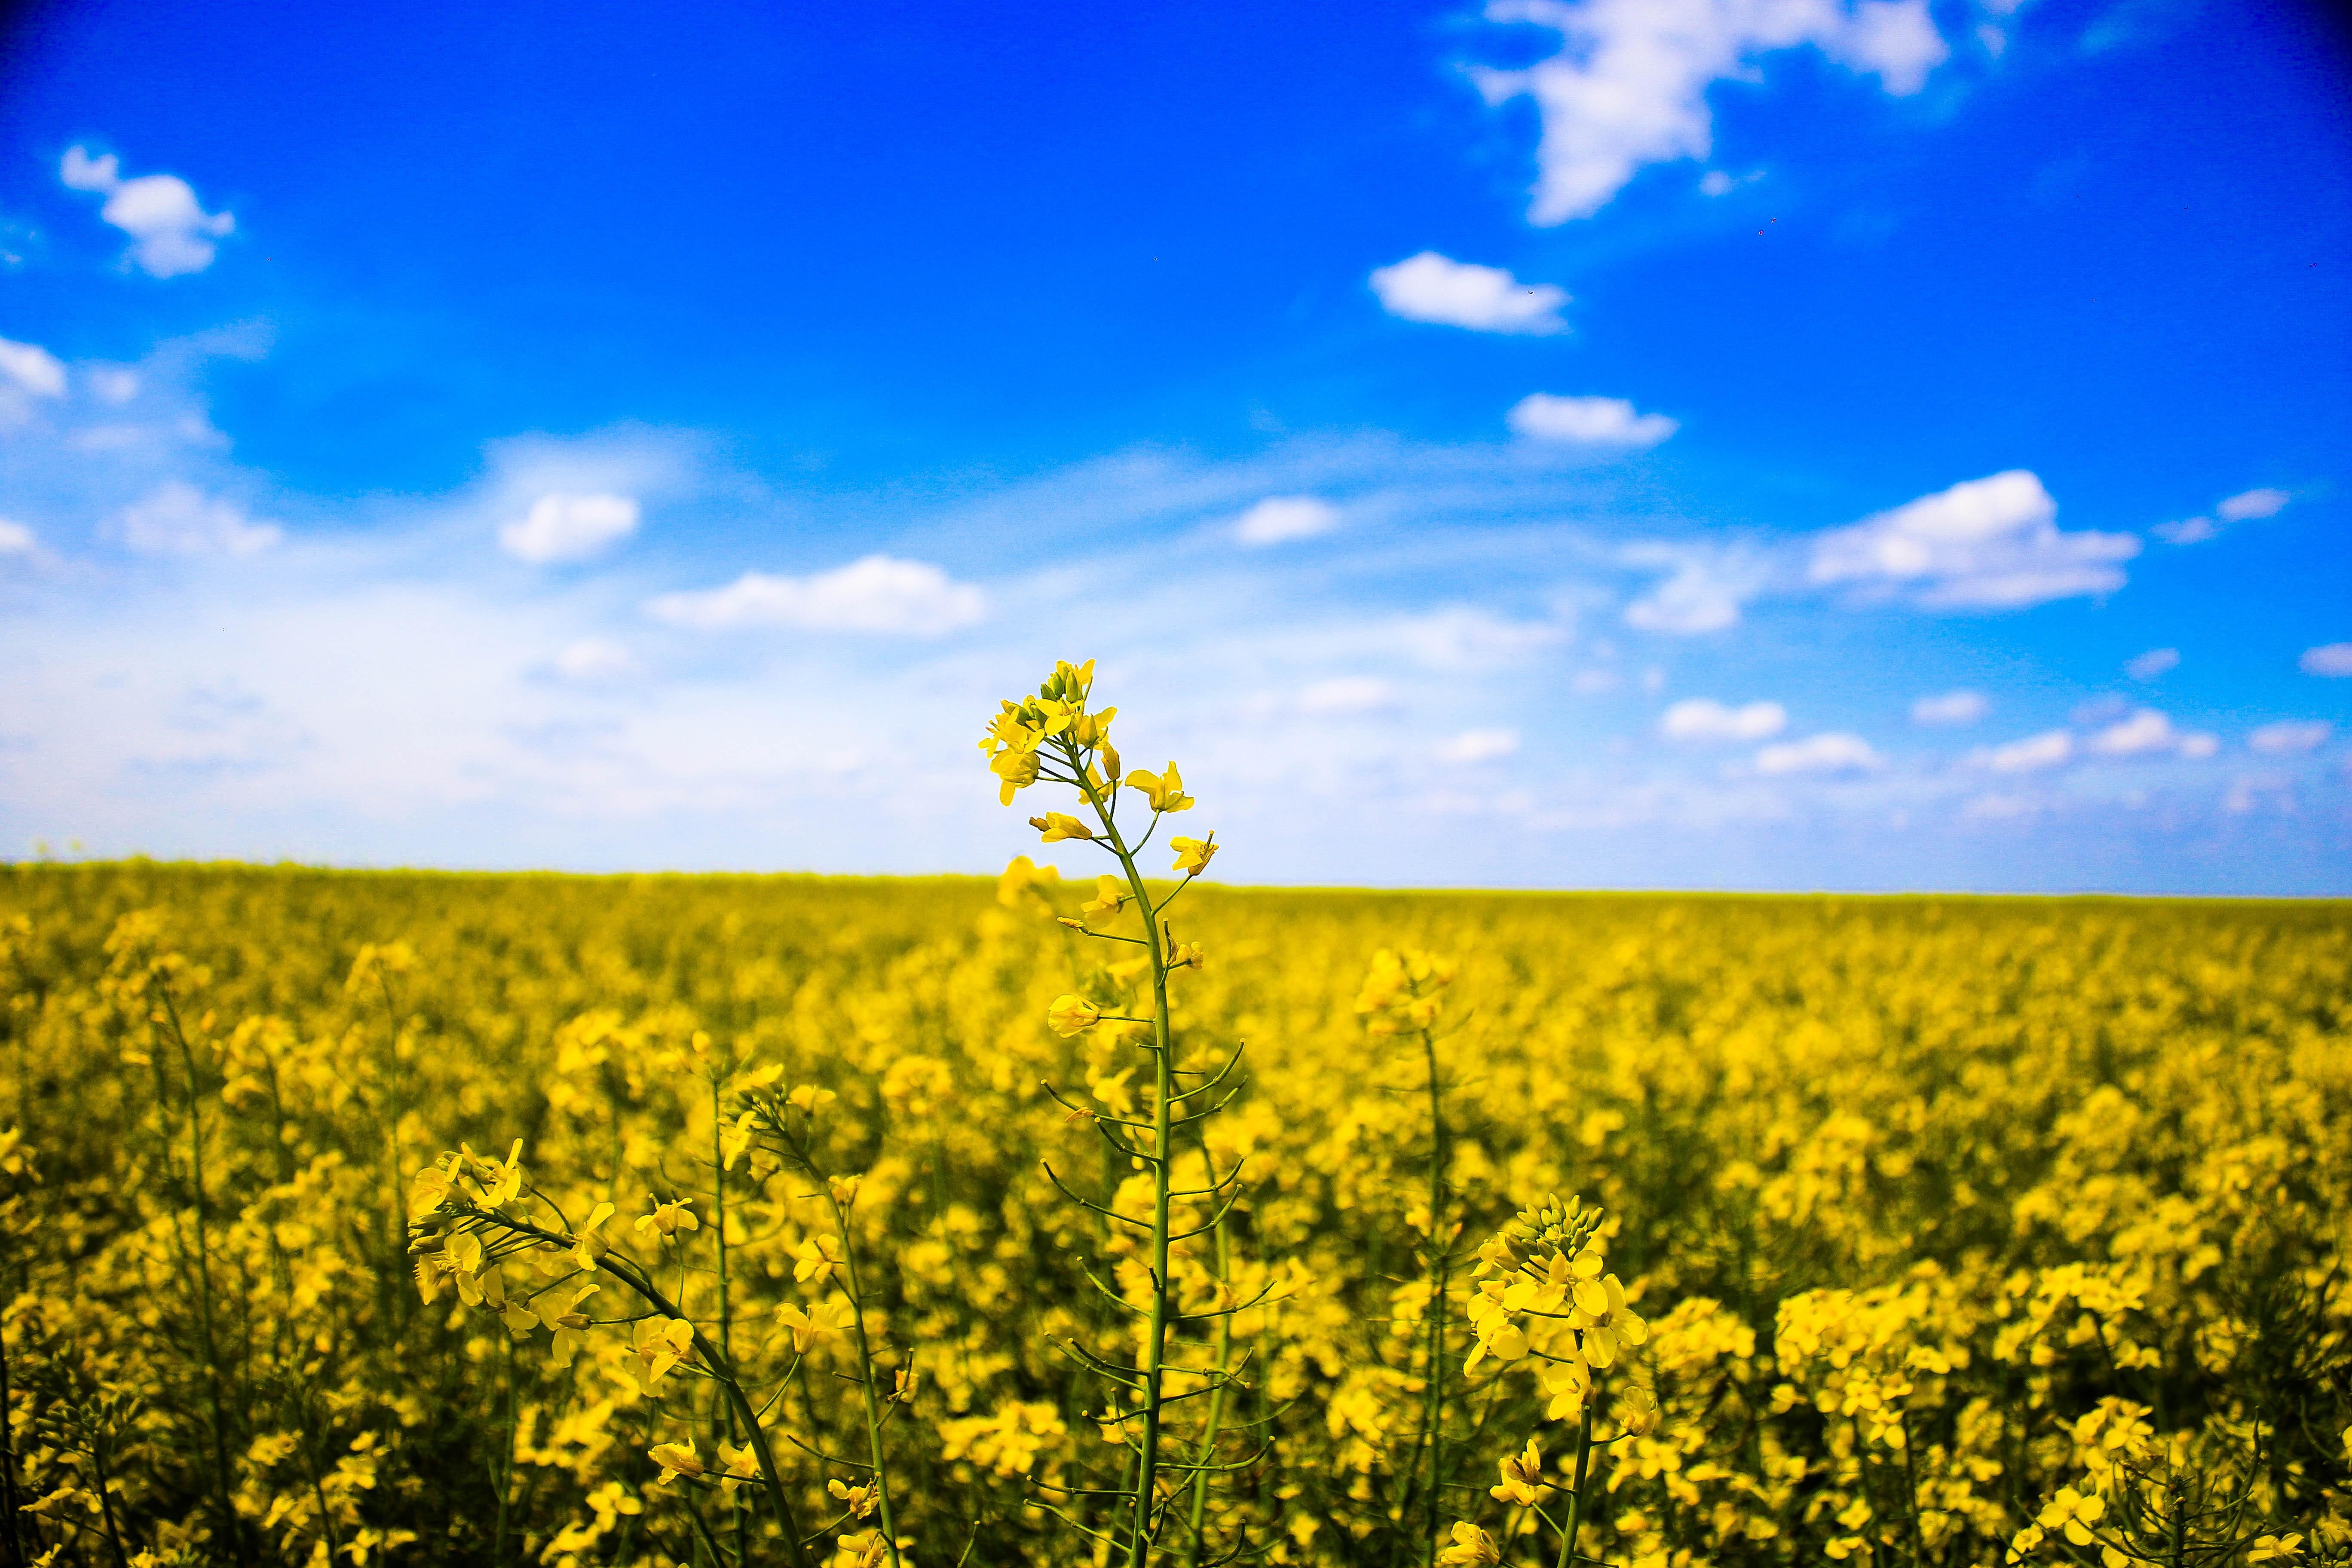 Grass field GMOs genetically modified organisms Europe European market food CAP